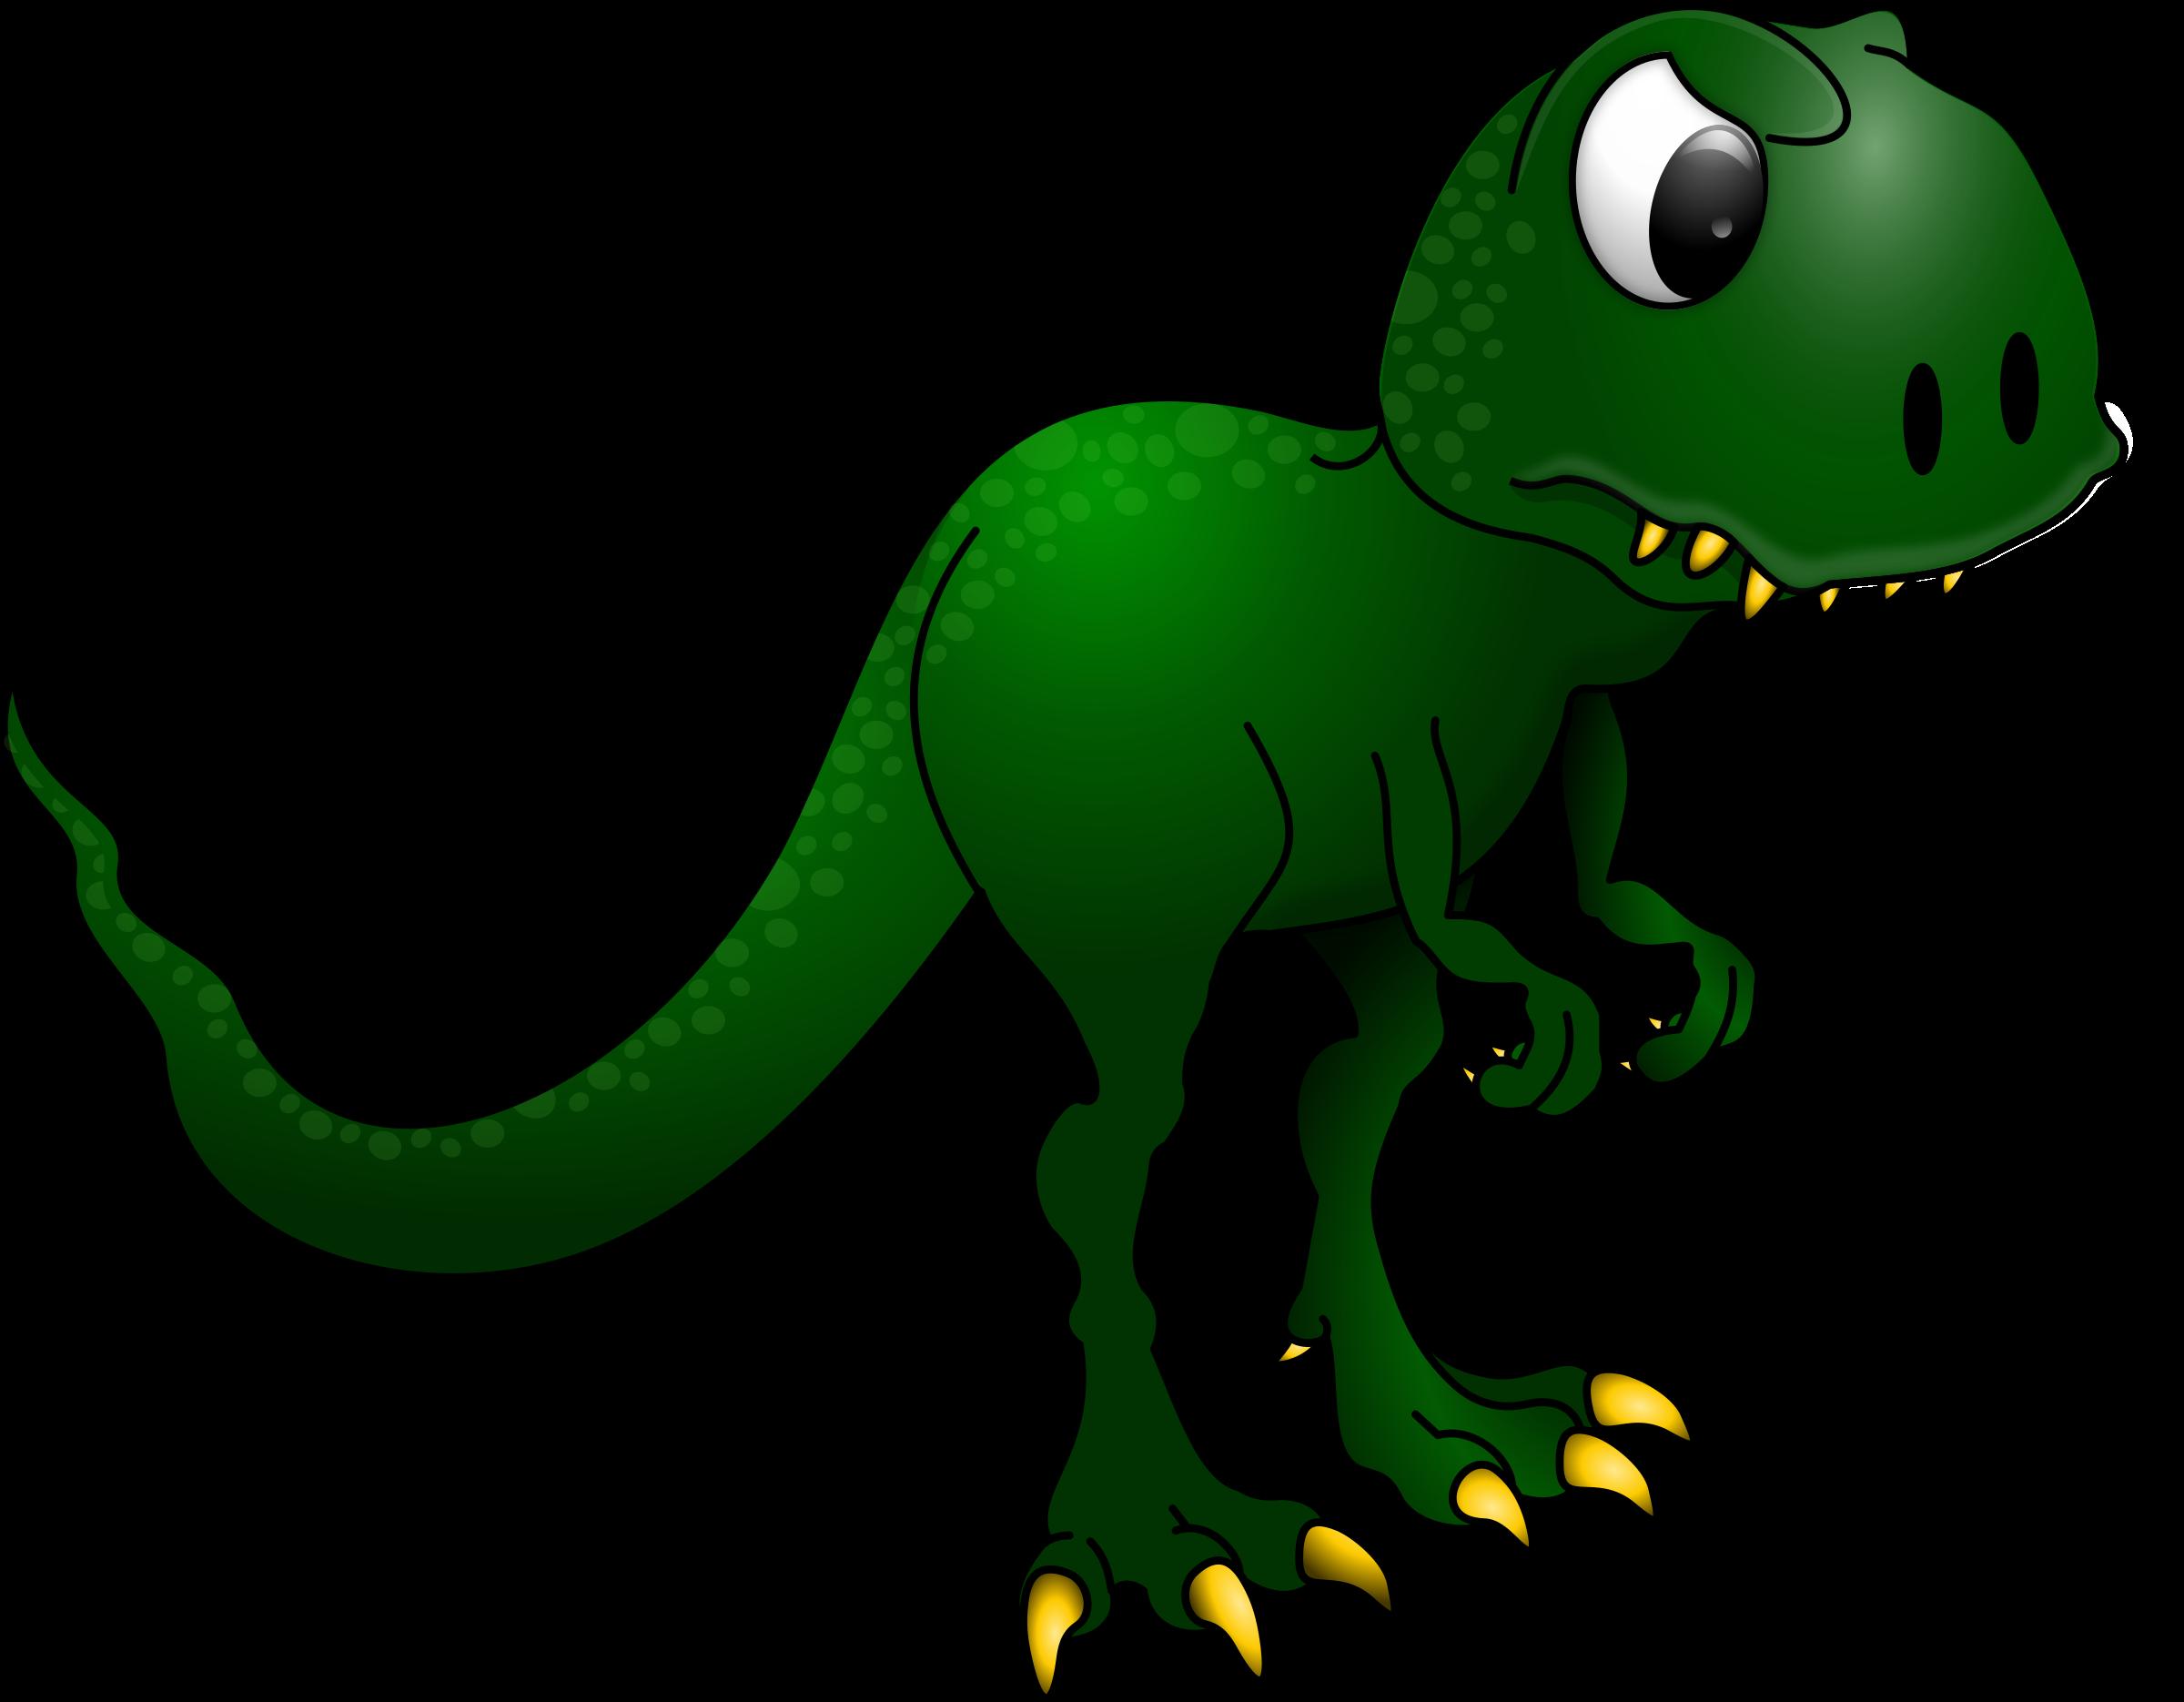 Dinosaur clipart tail. Remix big image png